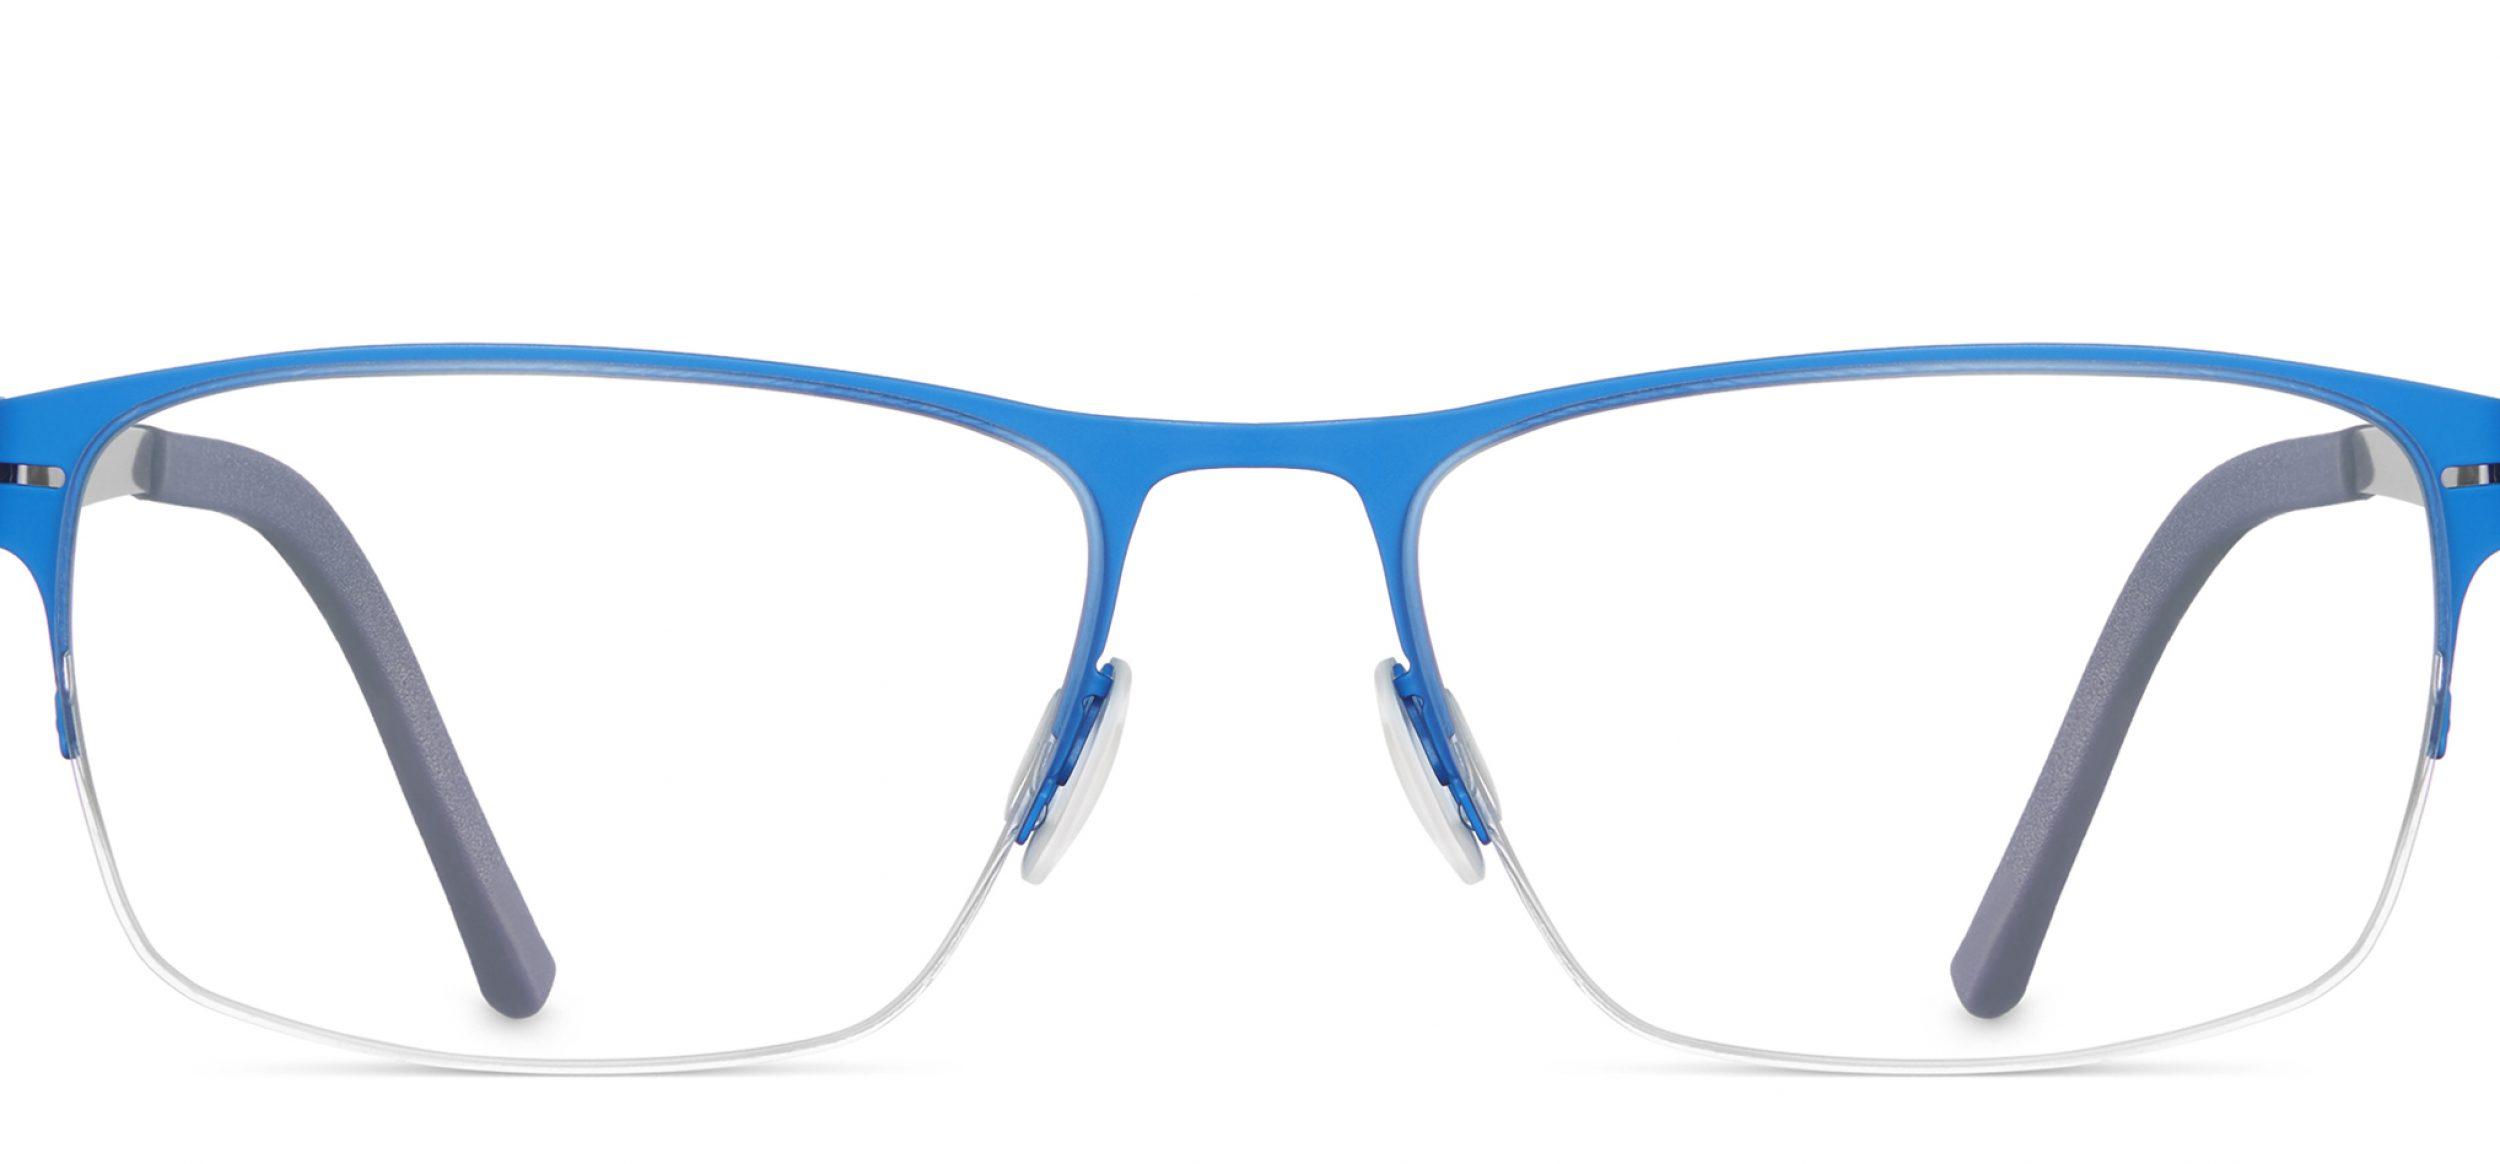 c5b6f58ed07 Ovvo Optics Eyewear available at Couture Eyewear